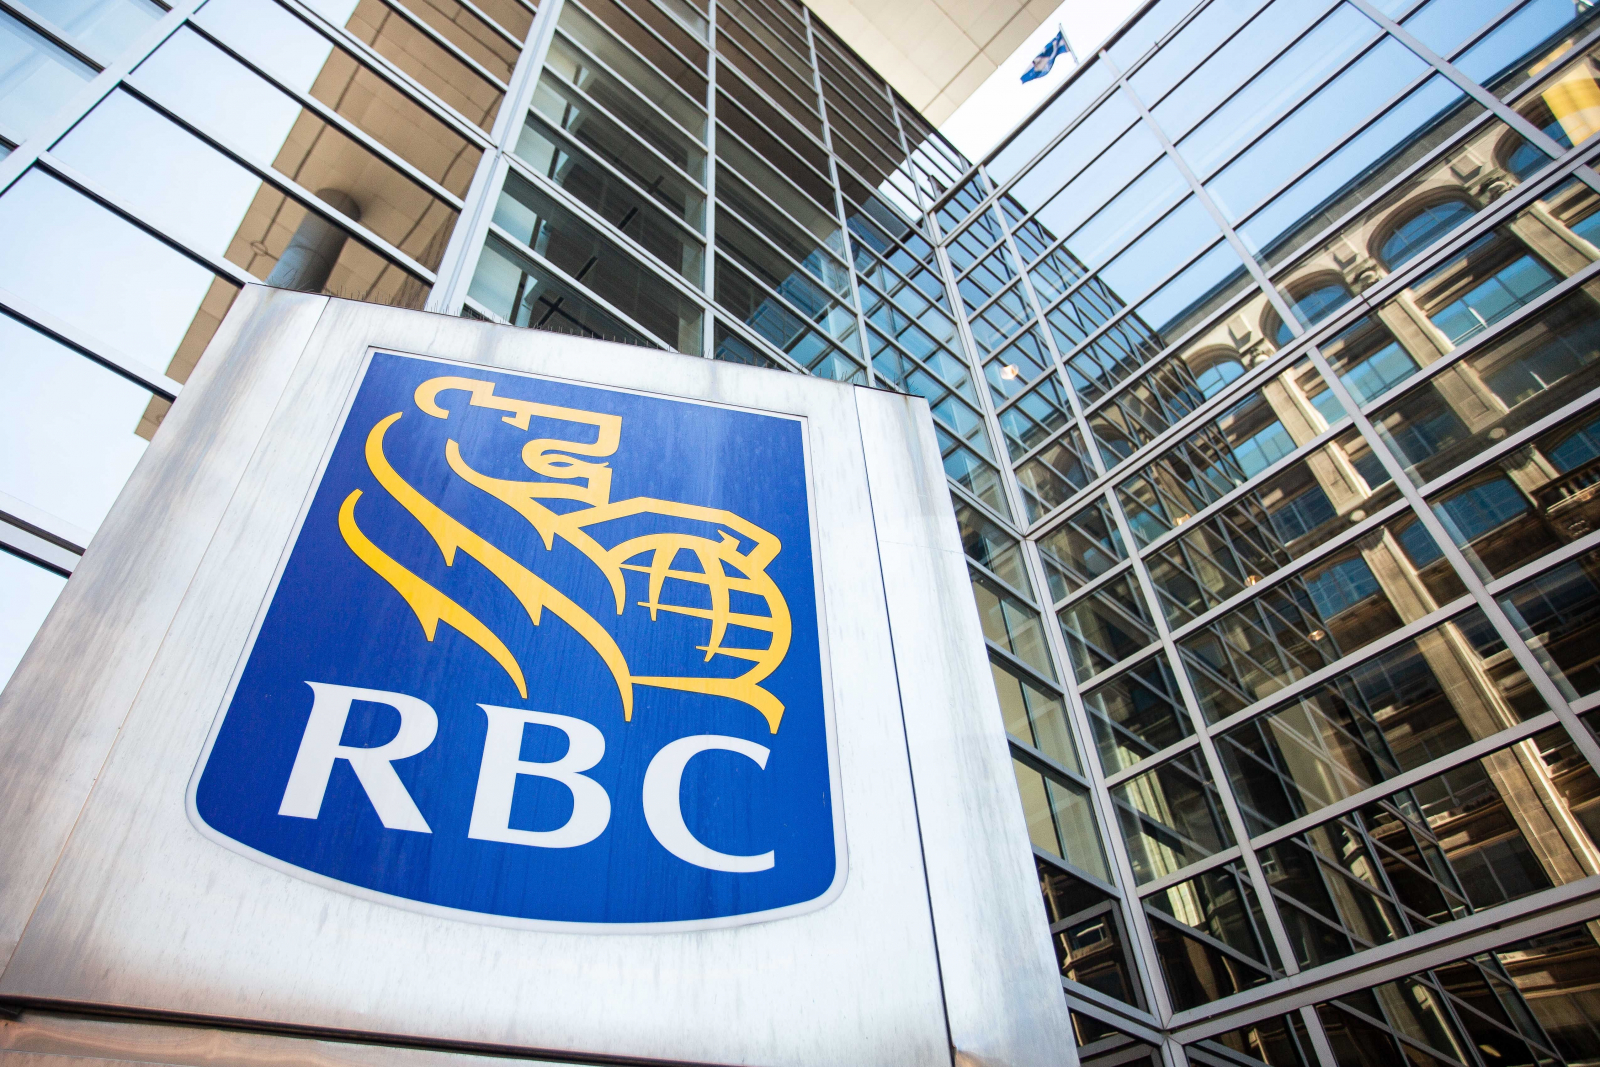 Rbc Employee Benefits